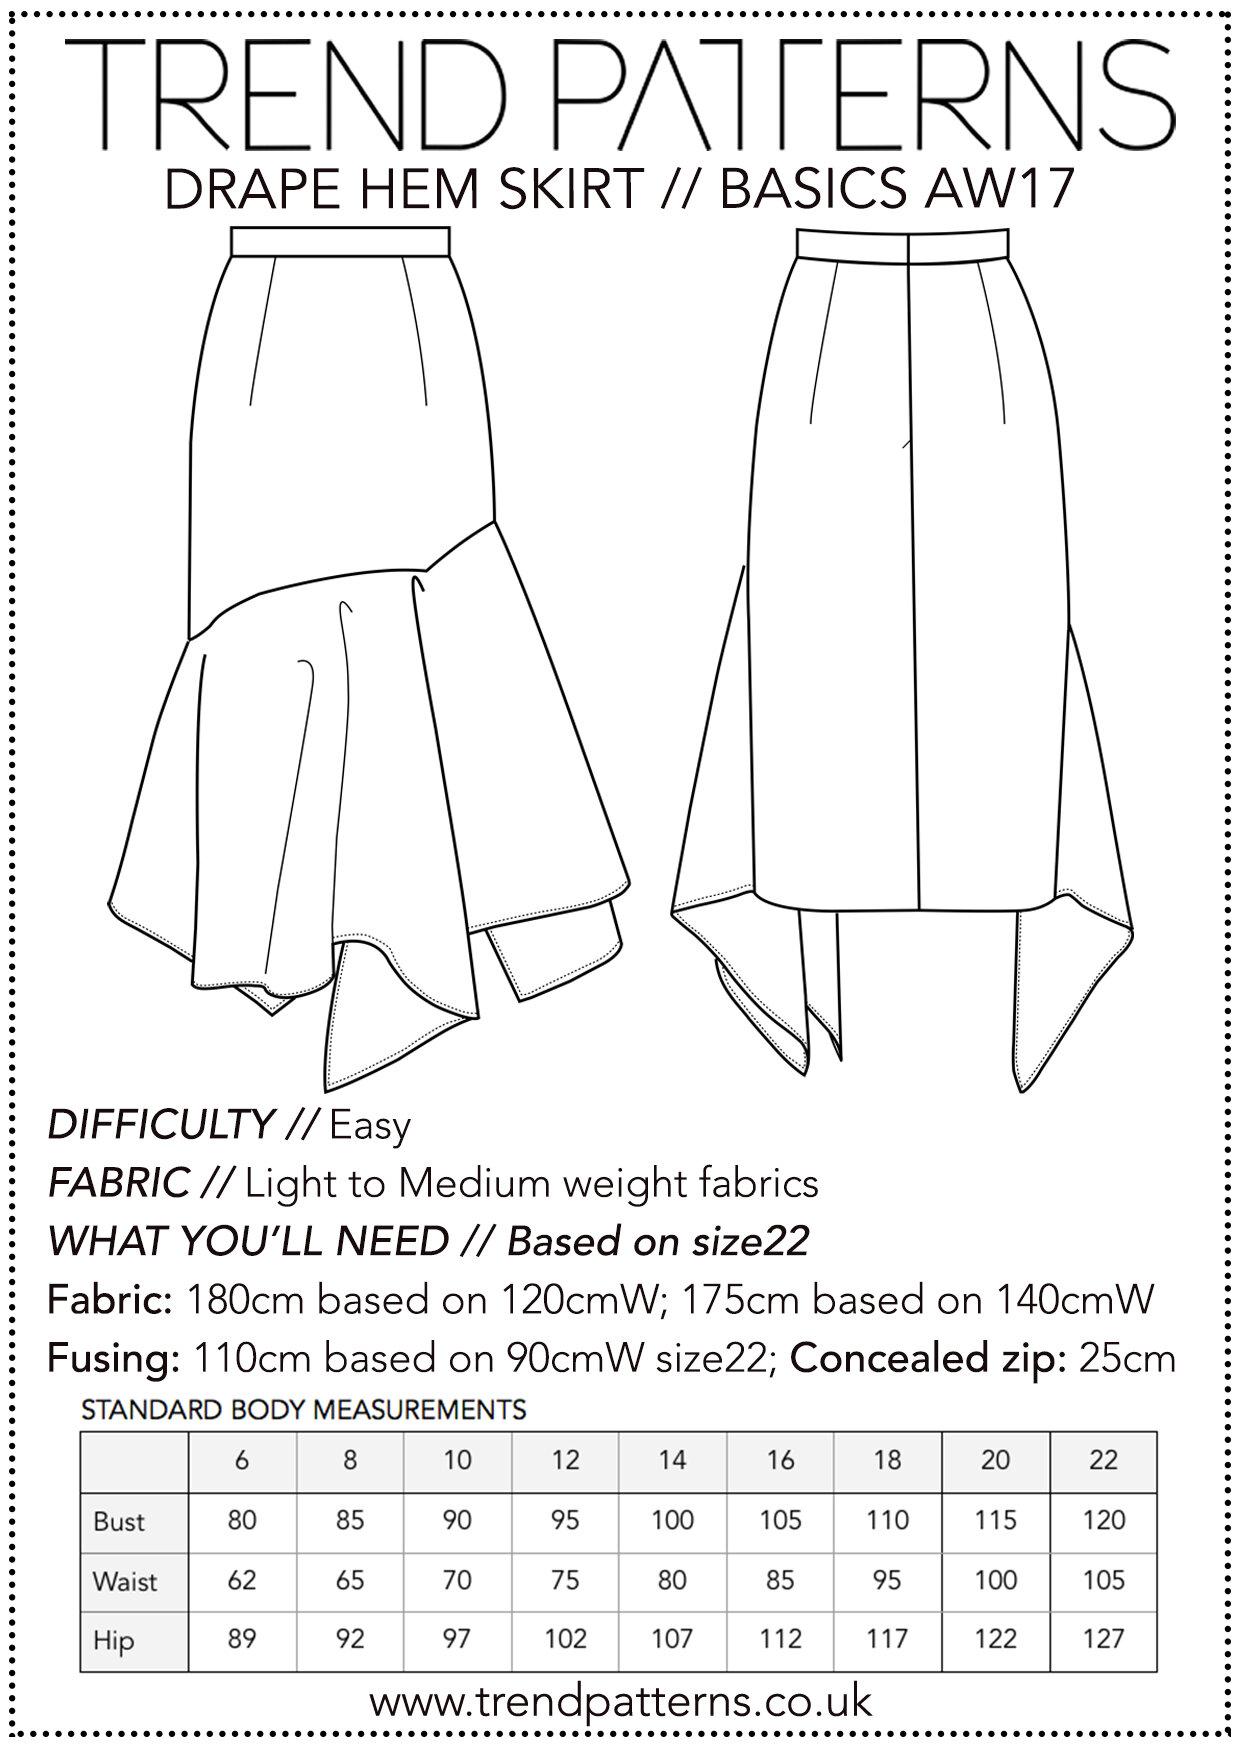 Tpc17 Drape Hem Skirt 8 22 Trend Patterns